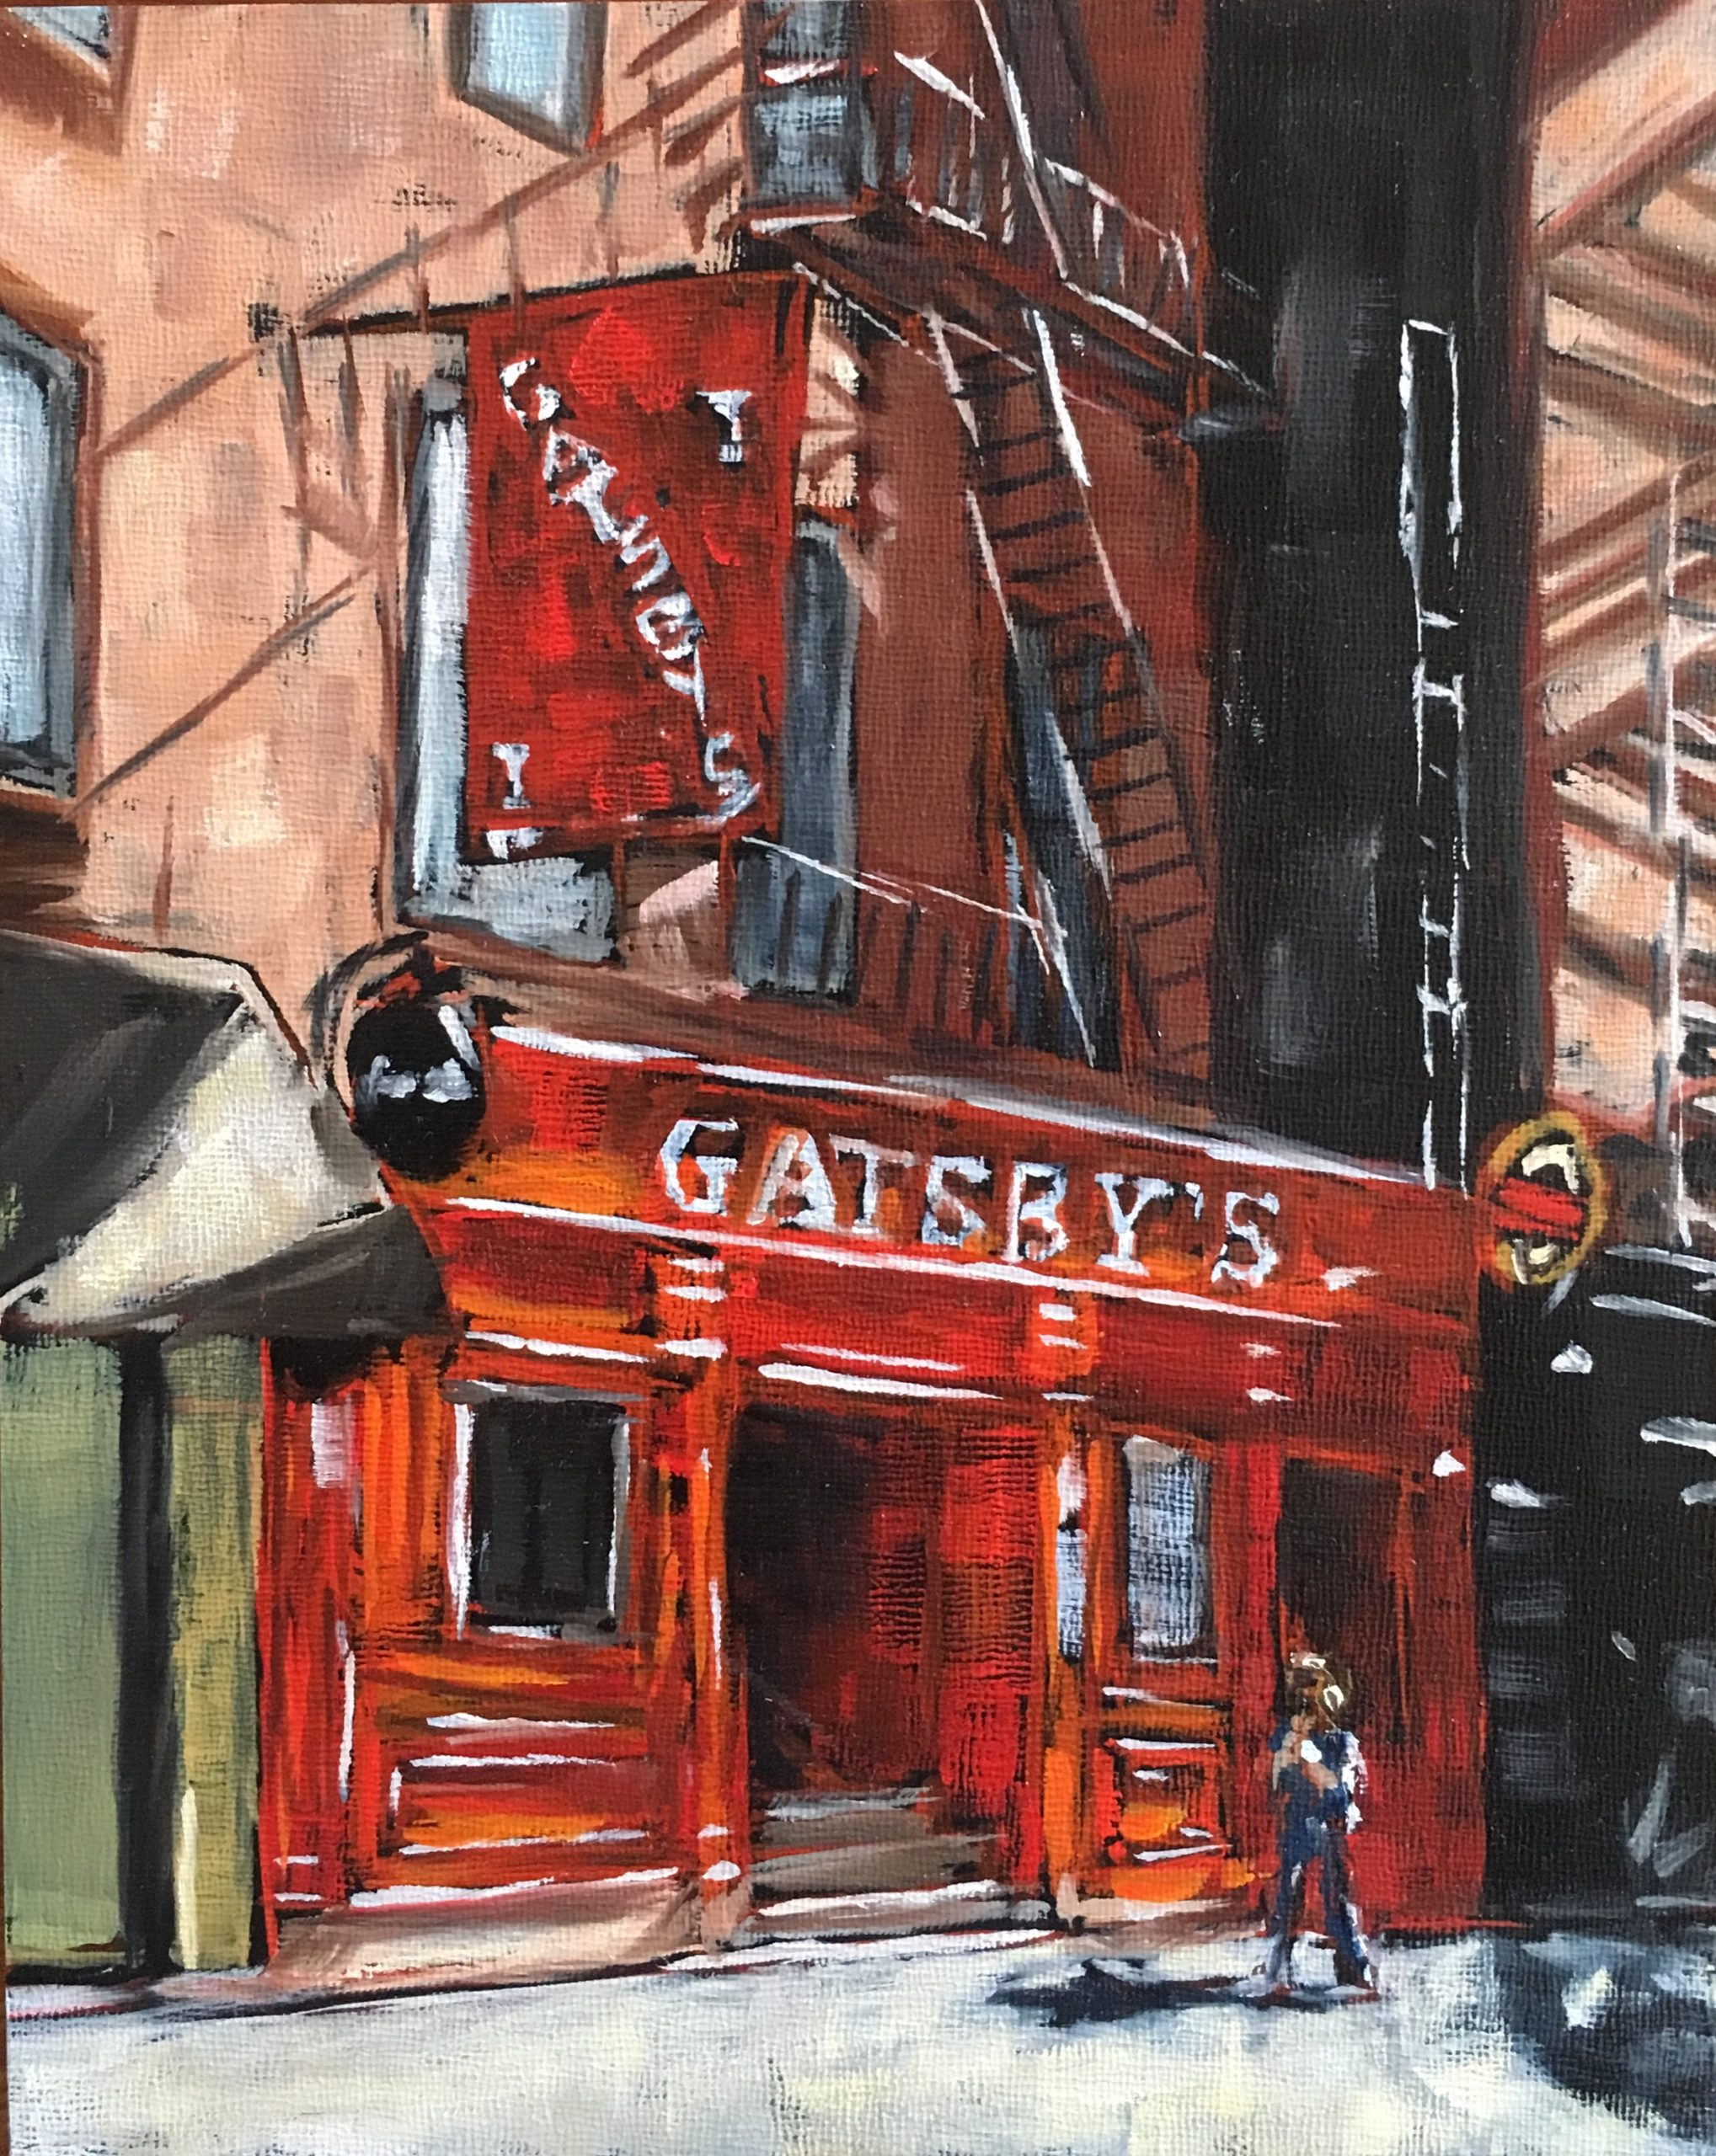 Gatsby's Bar, New York